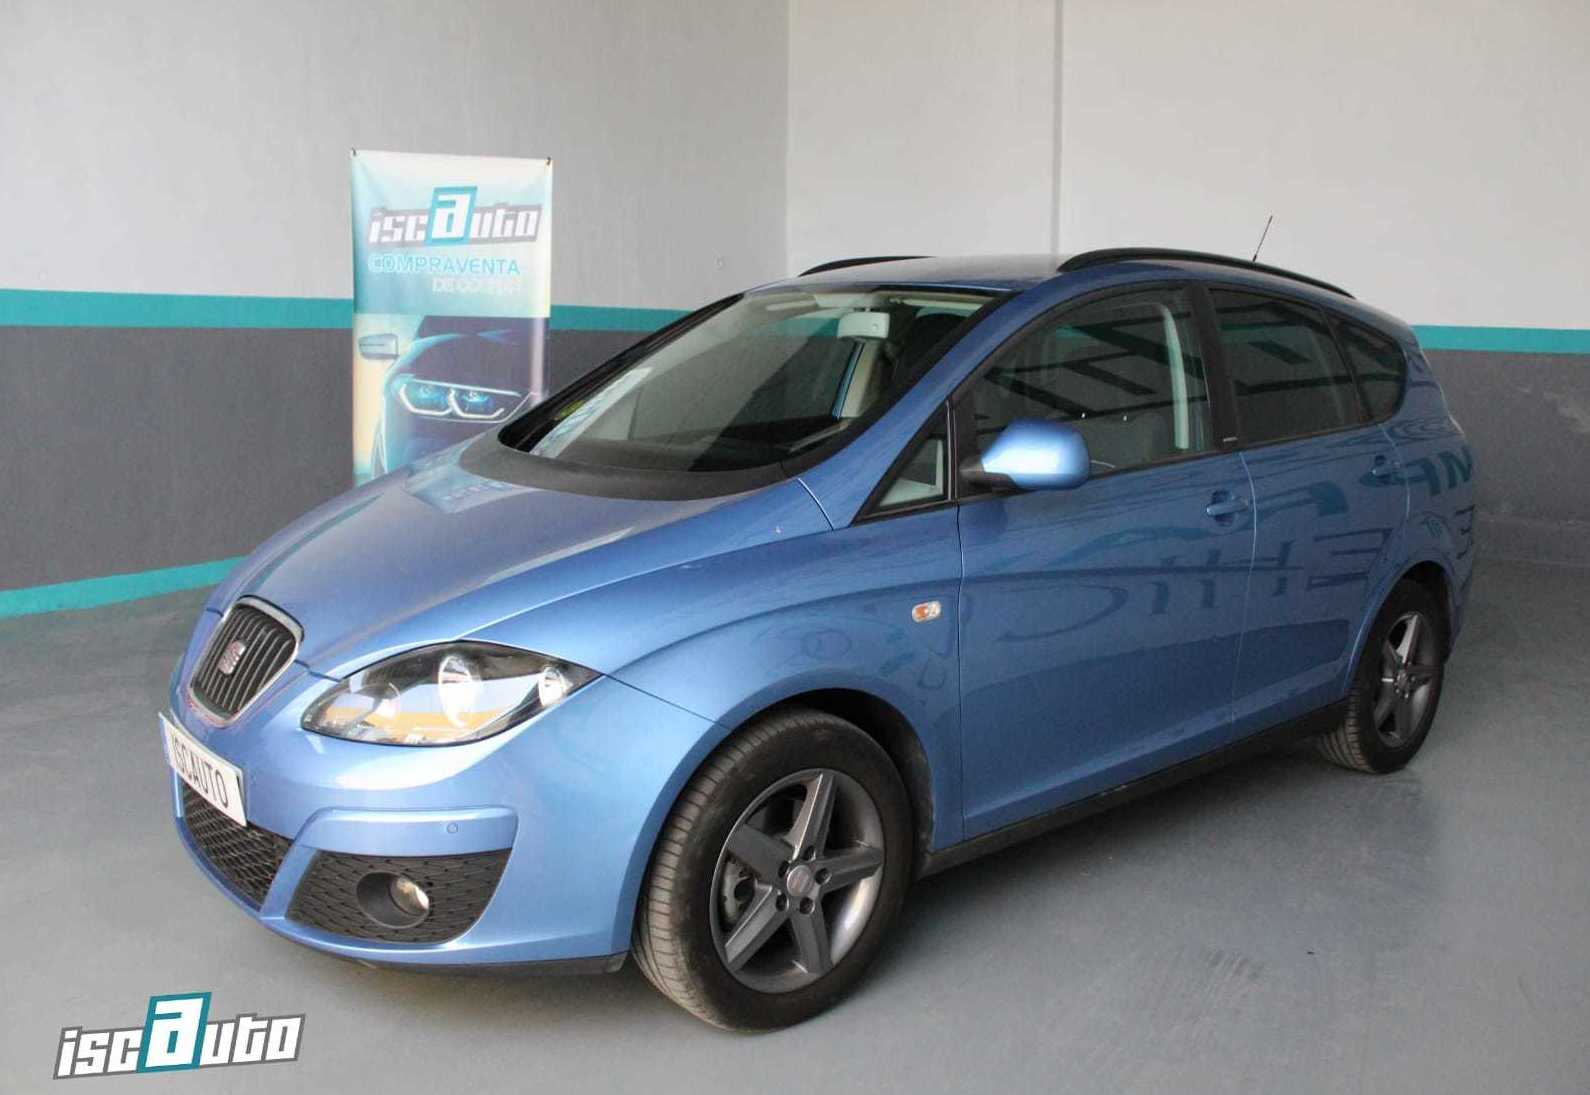 SEAT Altea XL 1.6TDI CR I-Tech Eco. Last Edition: Servicios de Iscauto